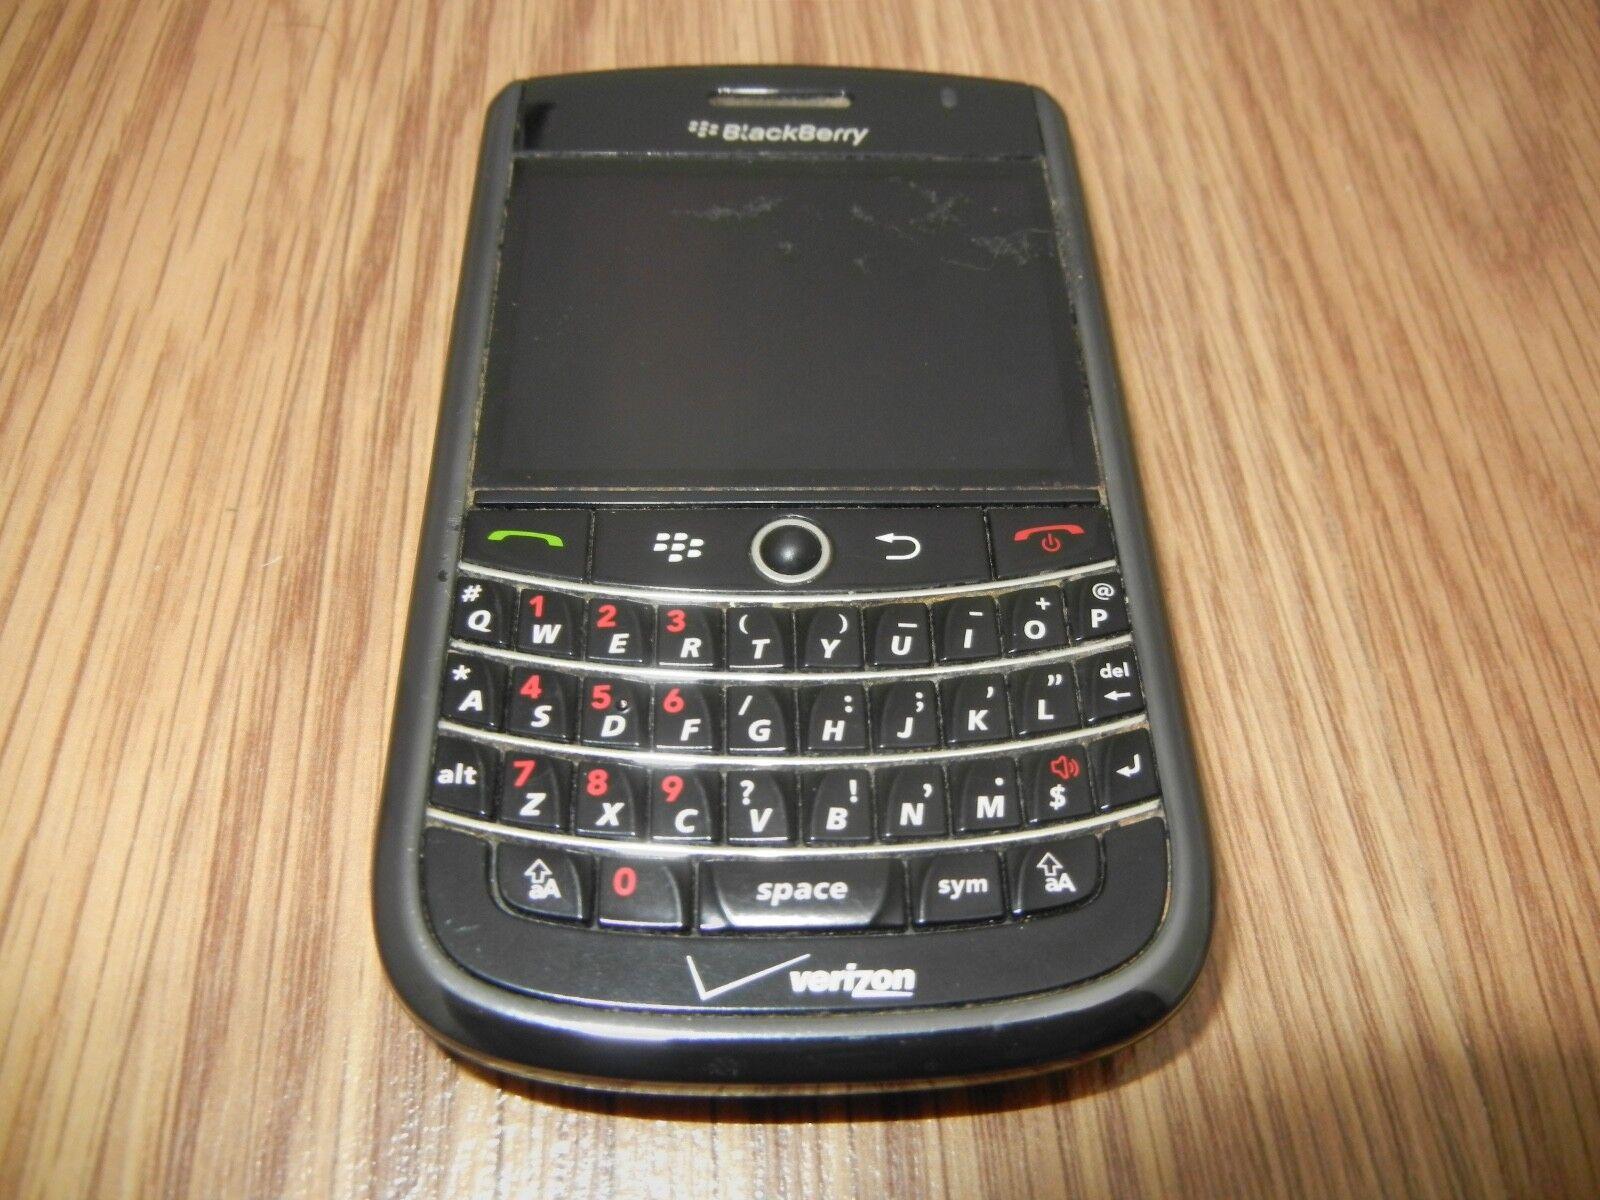 BlackBerry Tour 9630 Black Verizon Smartphone